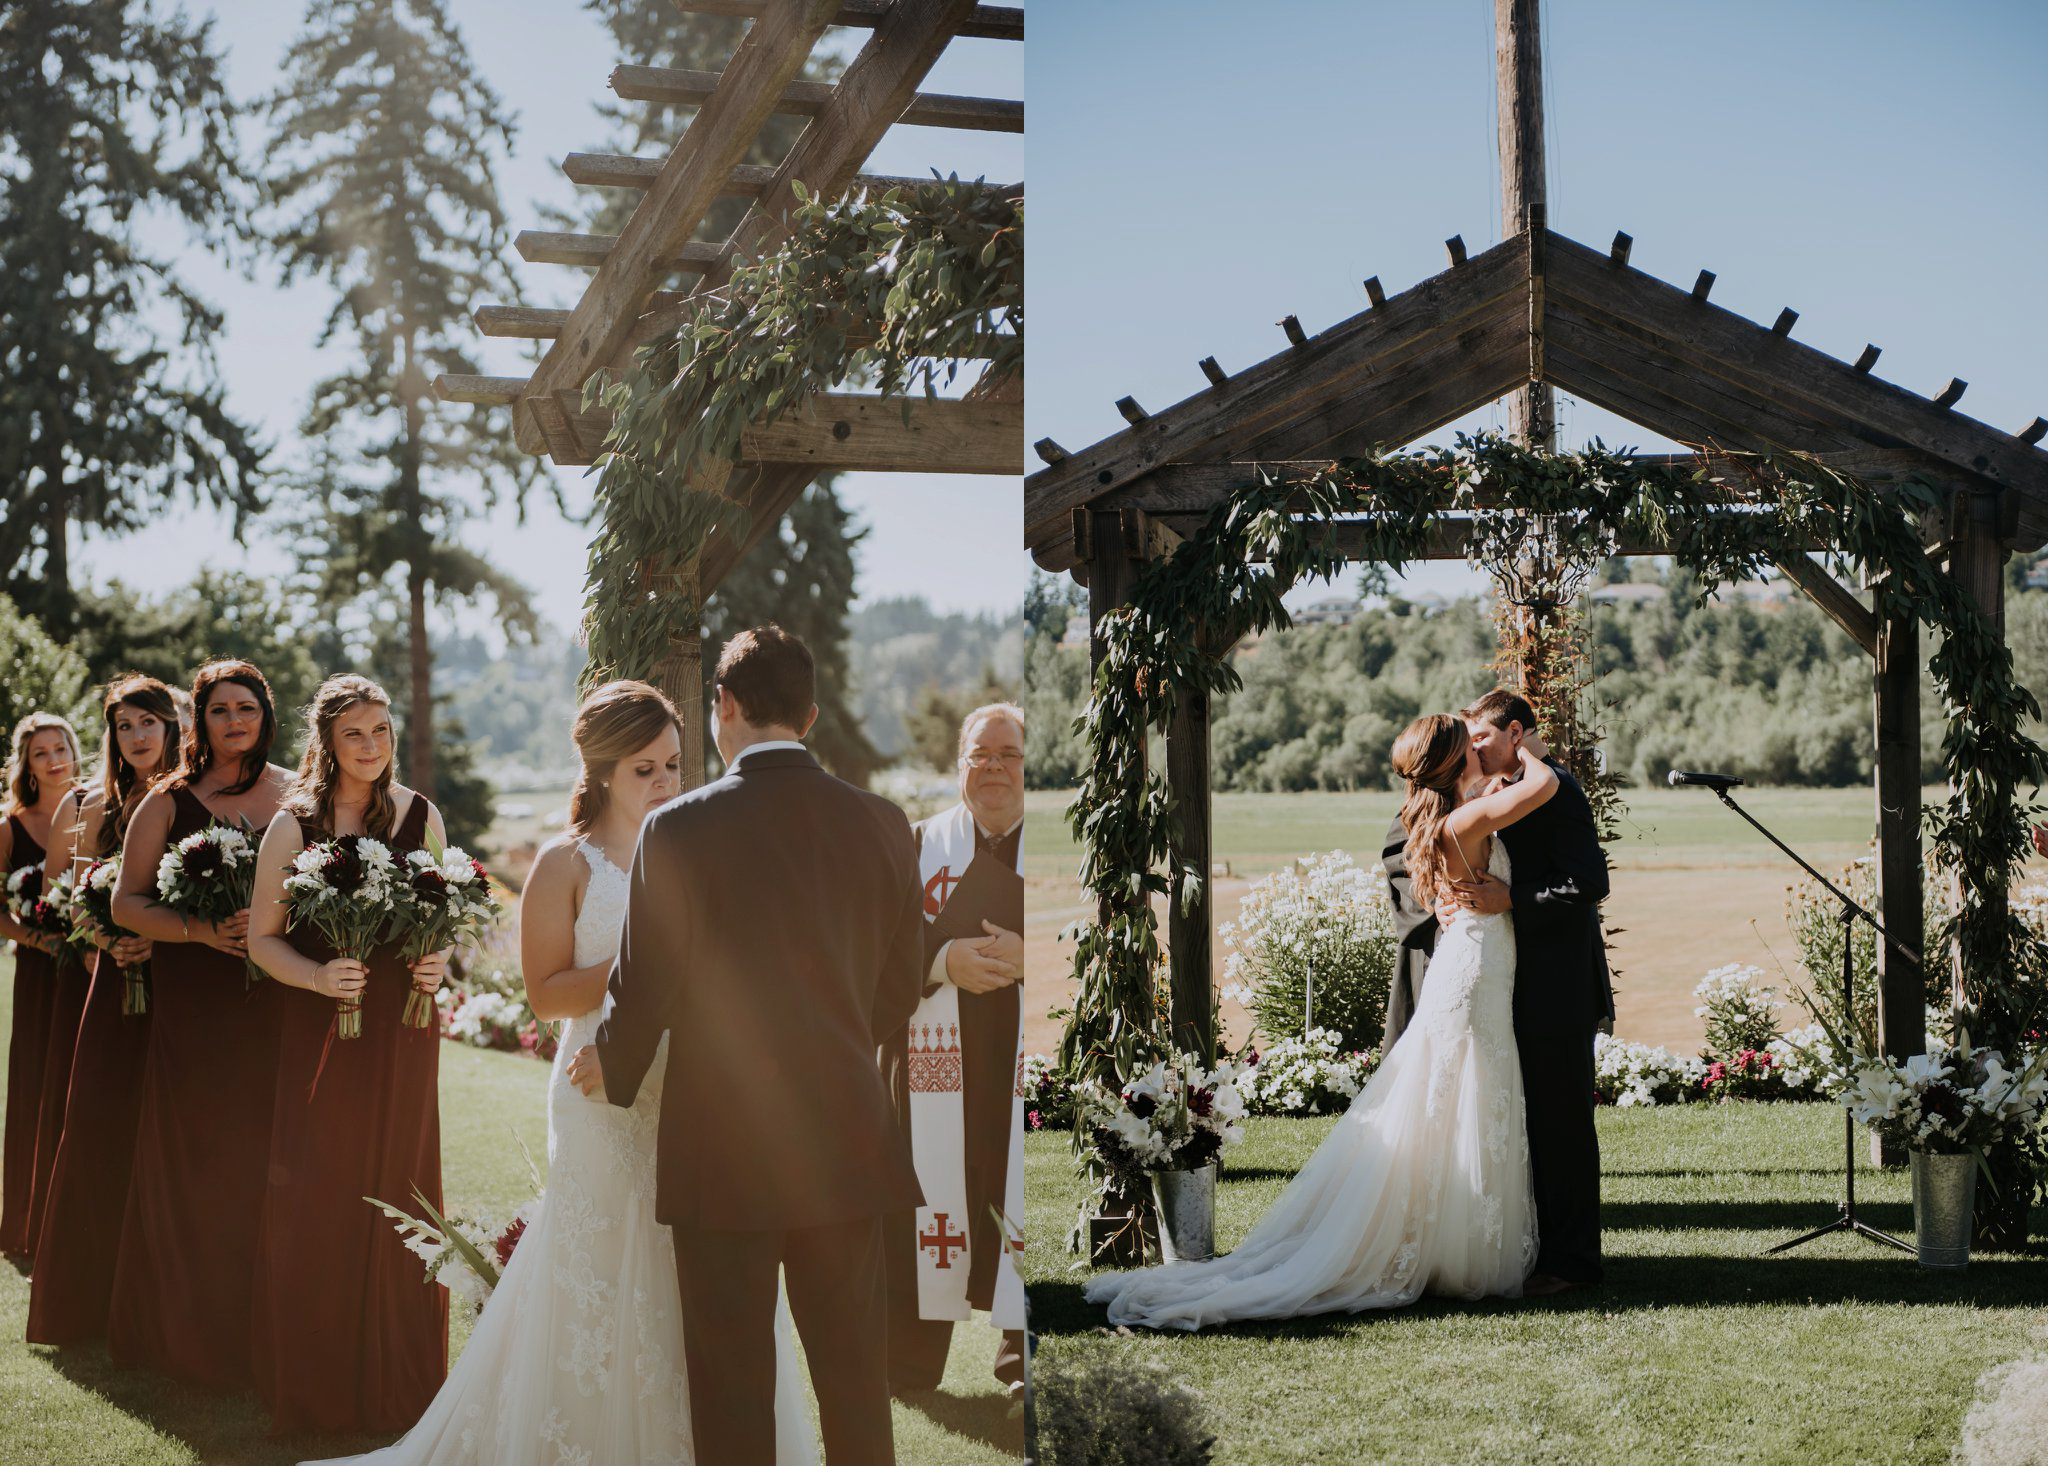 kristen-and-cody-the-kelley-farm-wedding-seattle-photographer-caitlyn-nikula-64.jpg